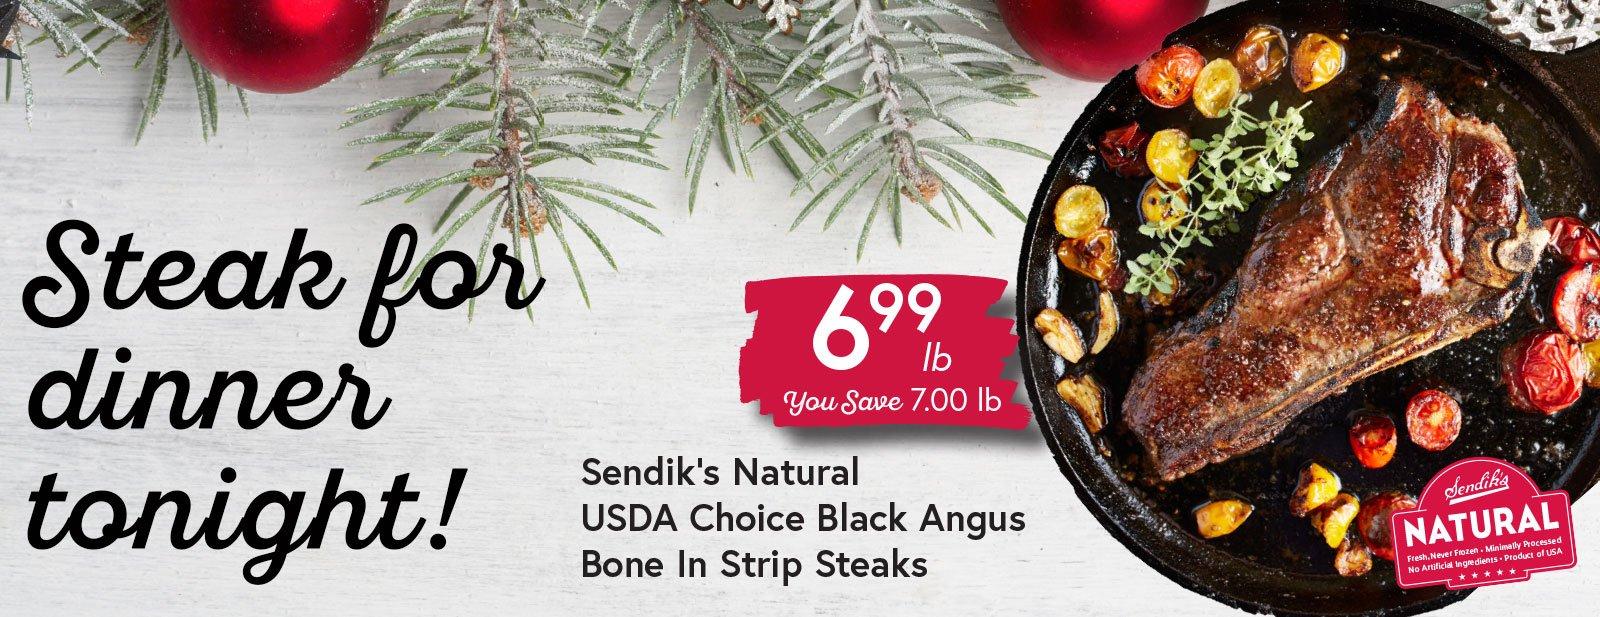 Sendik's Natural USDA Choice Black Angus Bone In Strip Steaks $6.99 lb